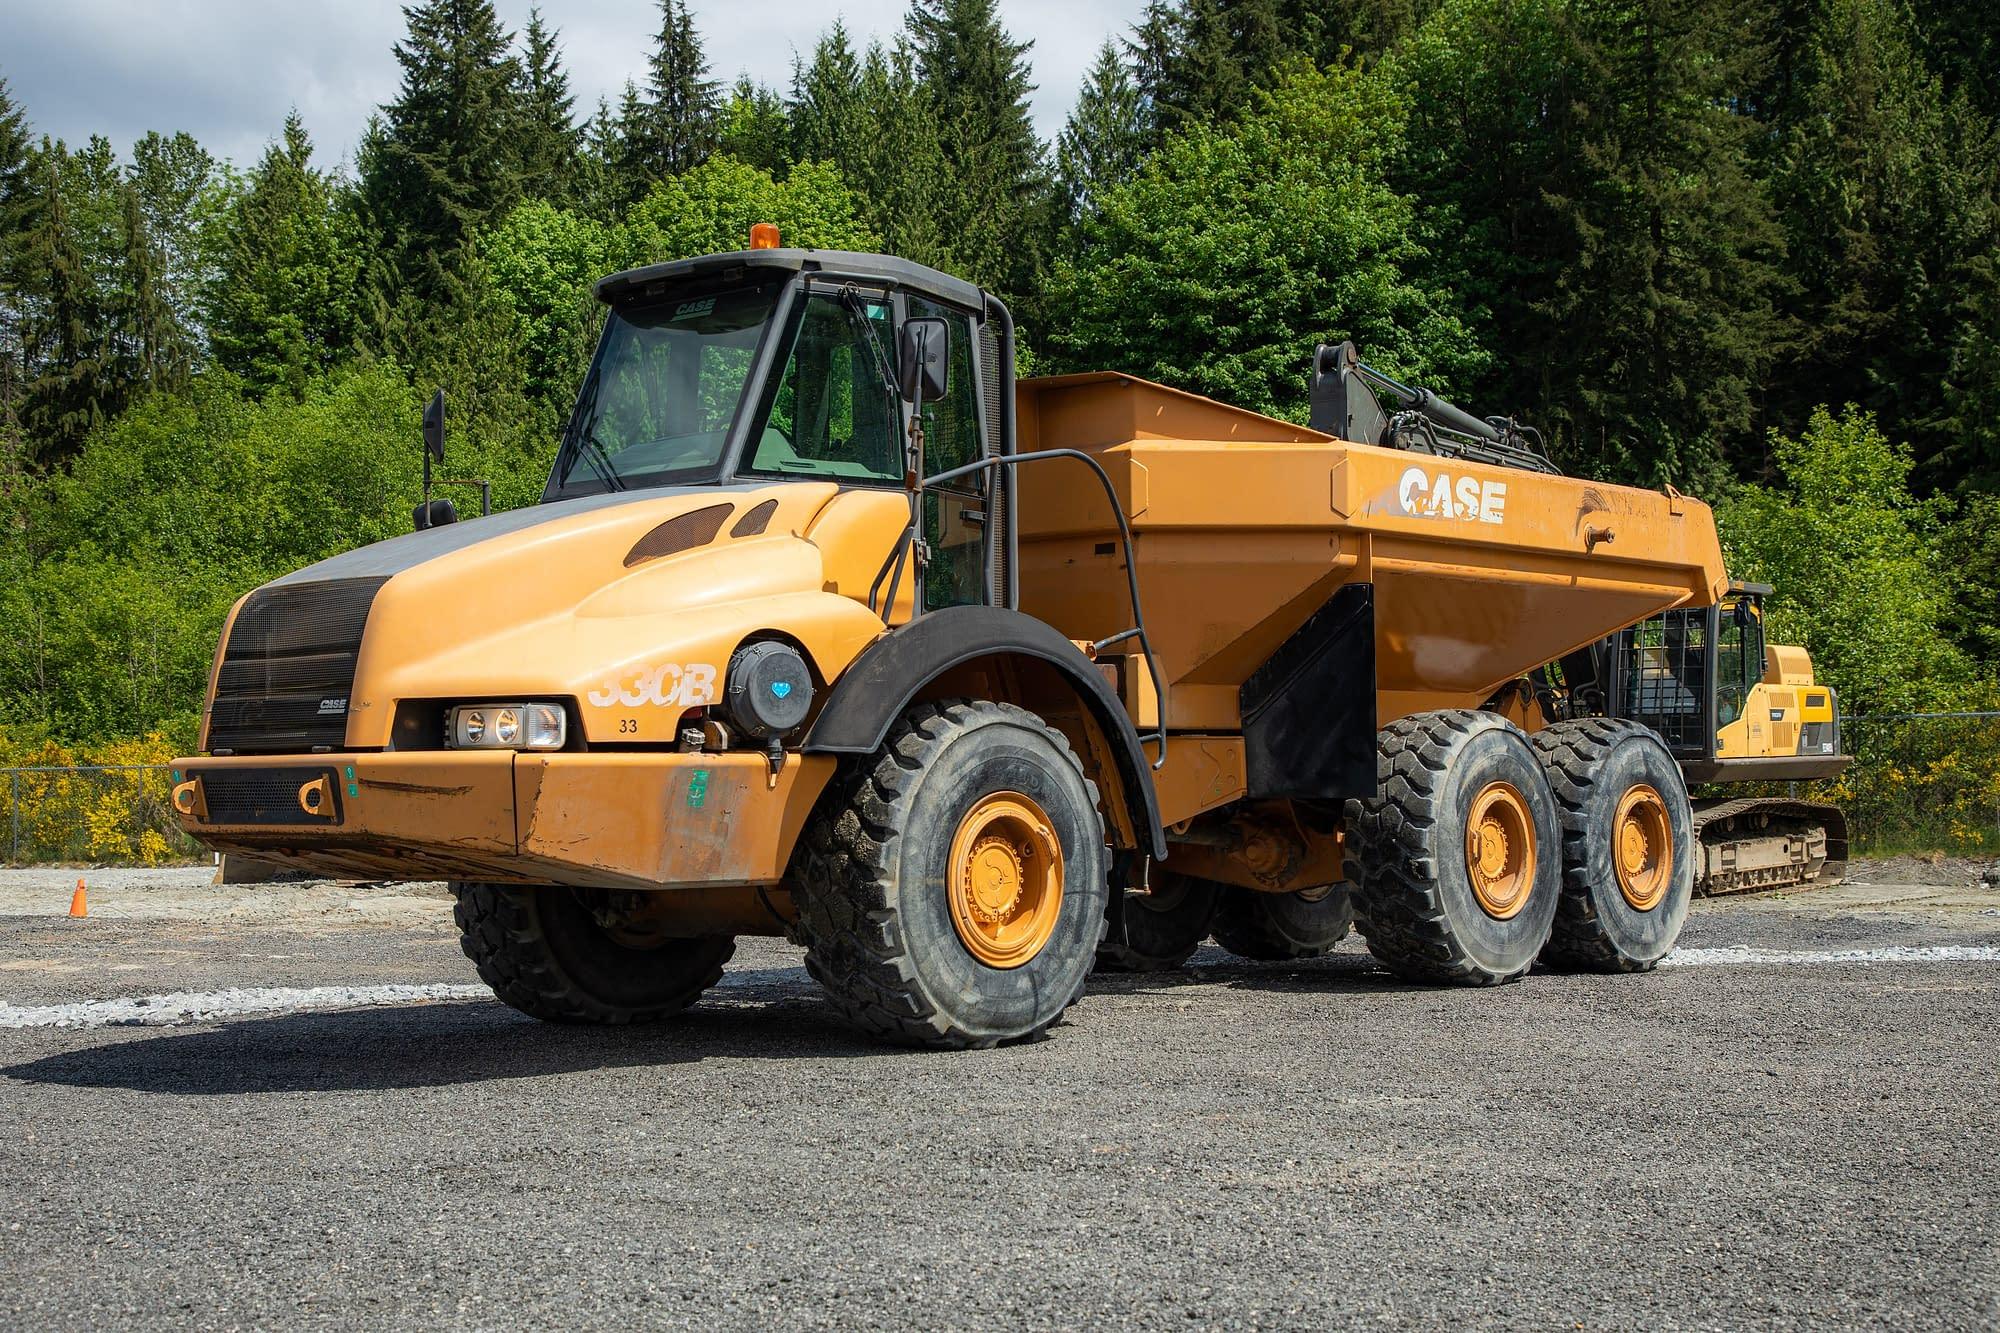 2007 Case 330B Articulated Dump Truck